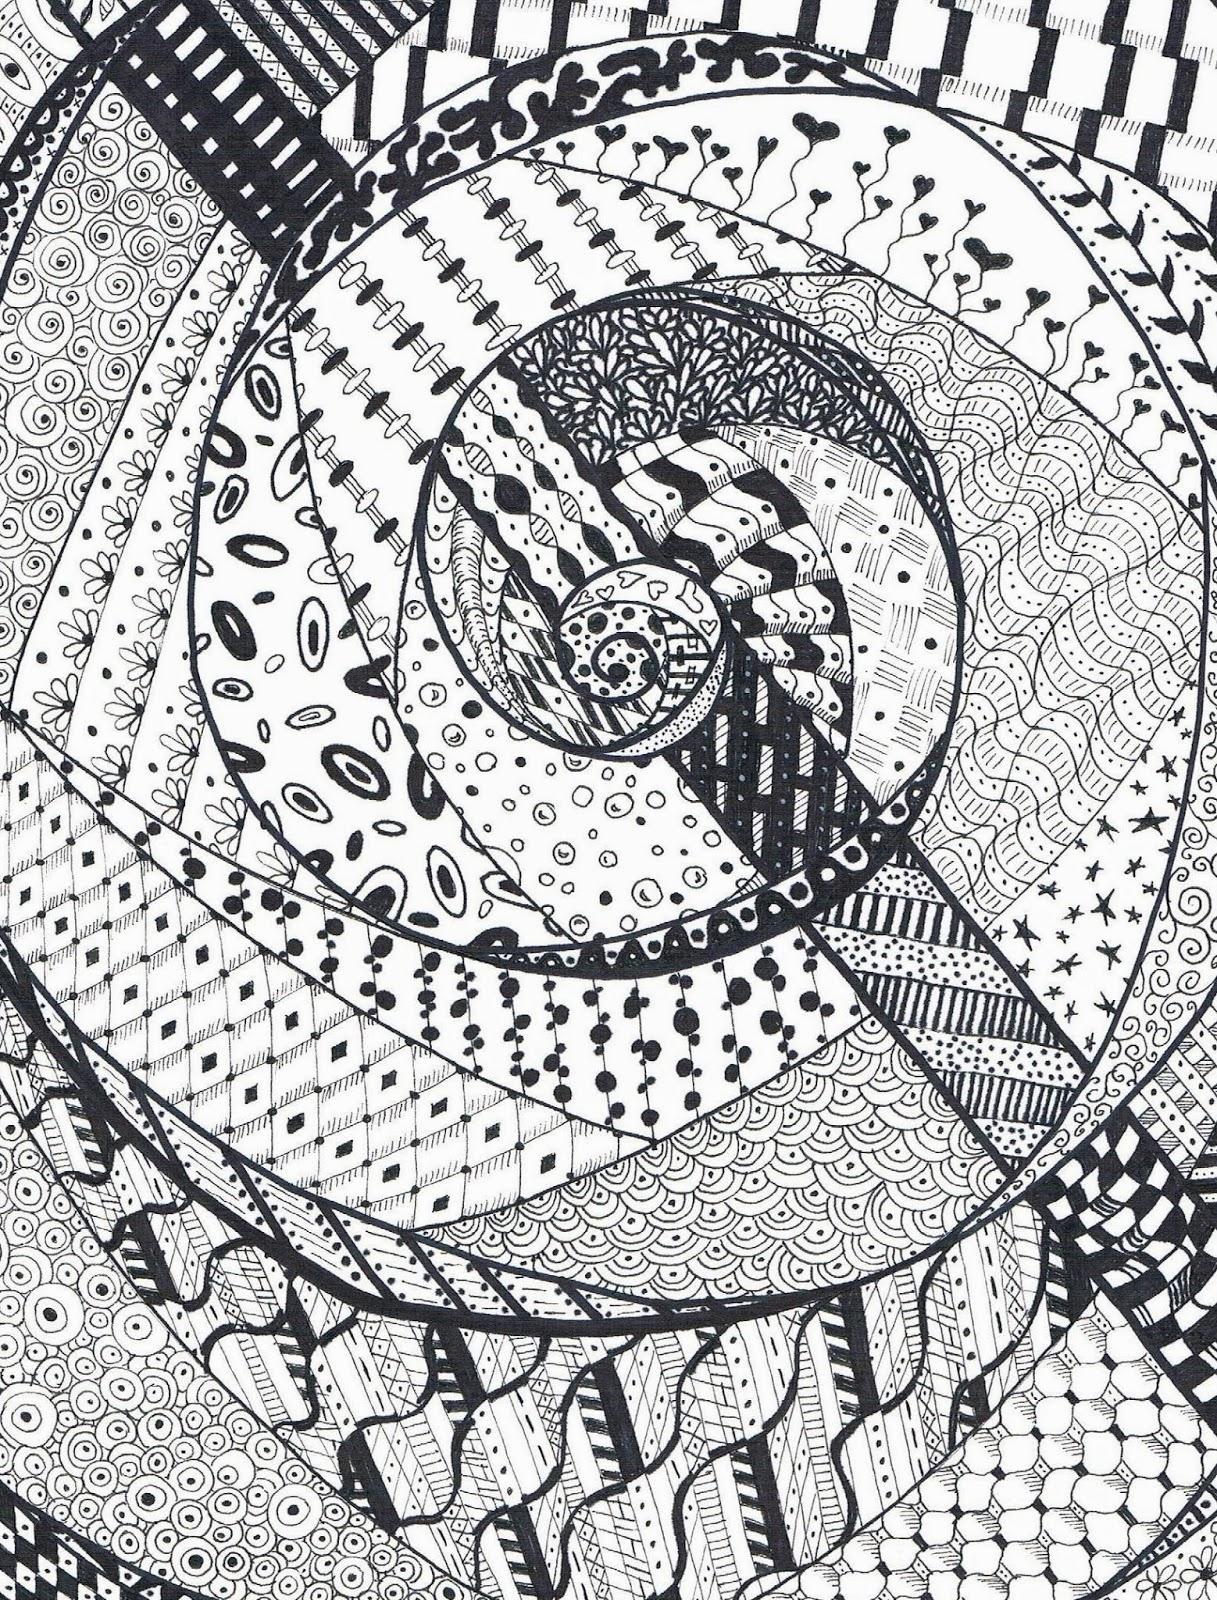 Win Dinn Art, Etc.: Rectangular Zen Doodle